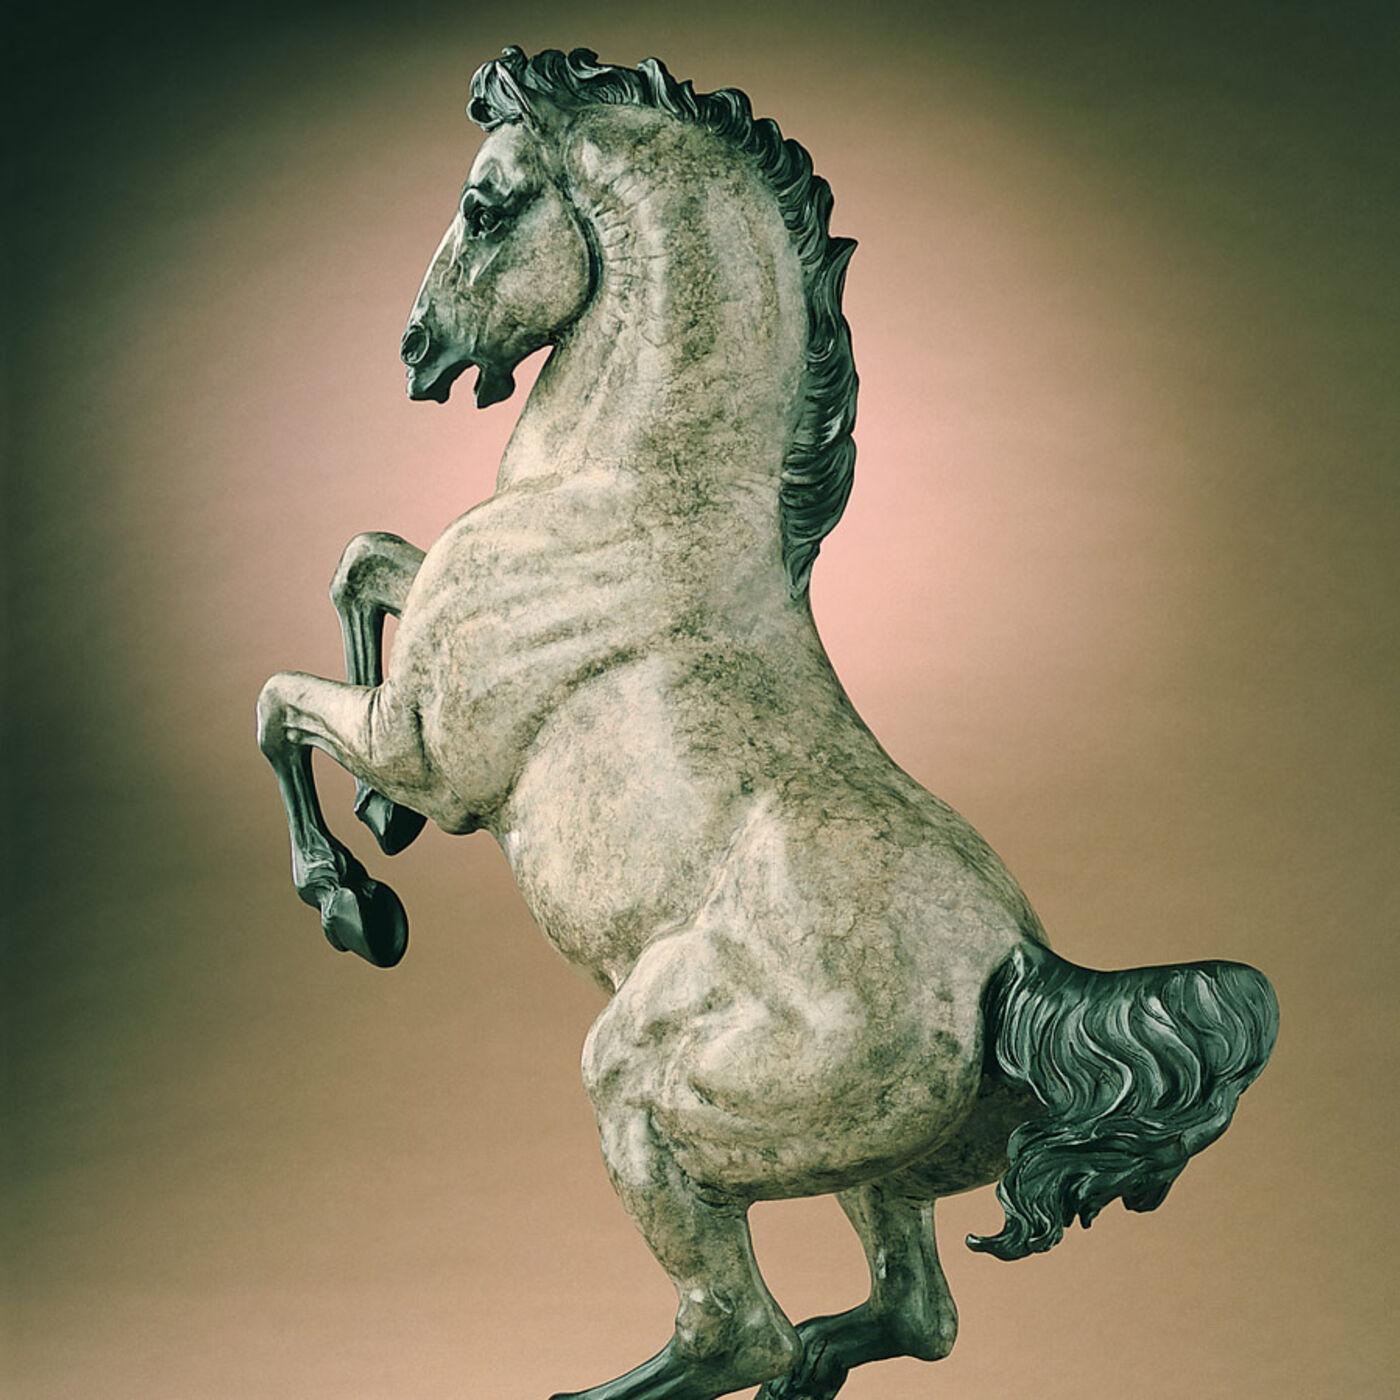 Star Liana York (Part ONE): Western/Wildlife Sculptor - Epi. 141, Host Dr. Mark Sublette